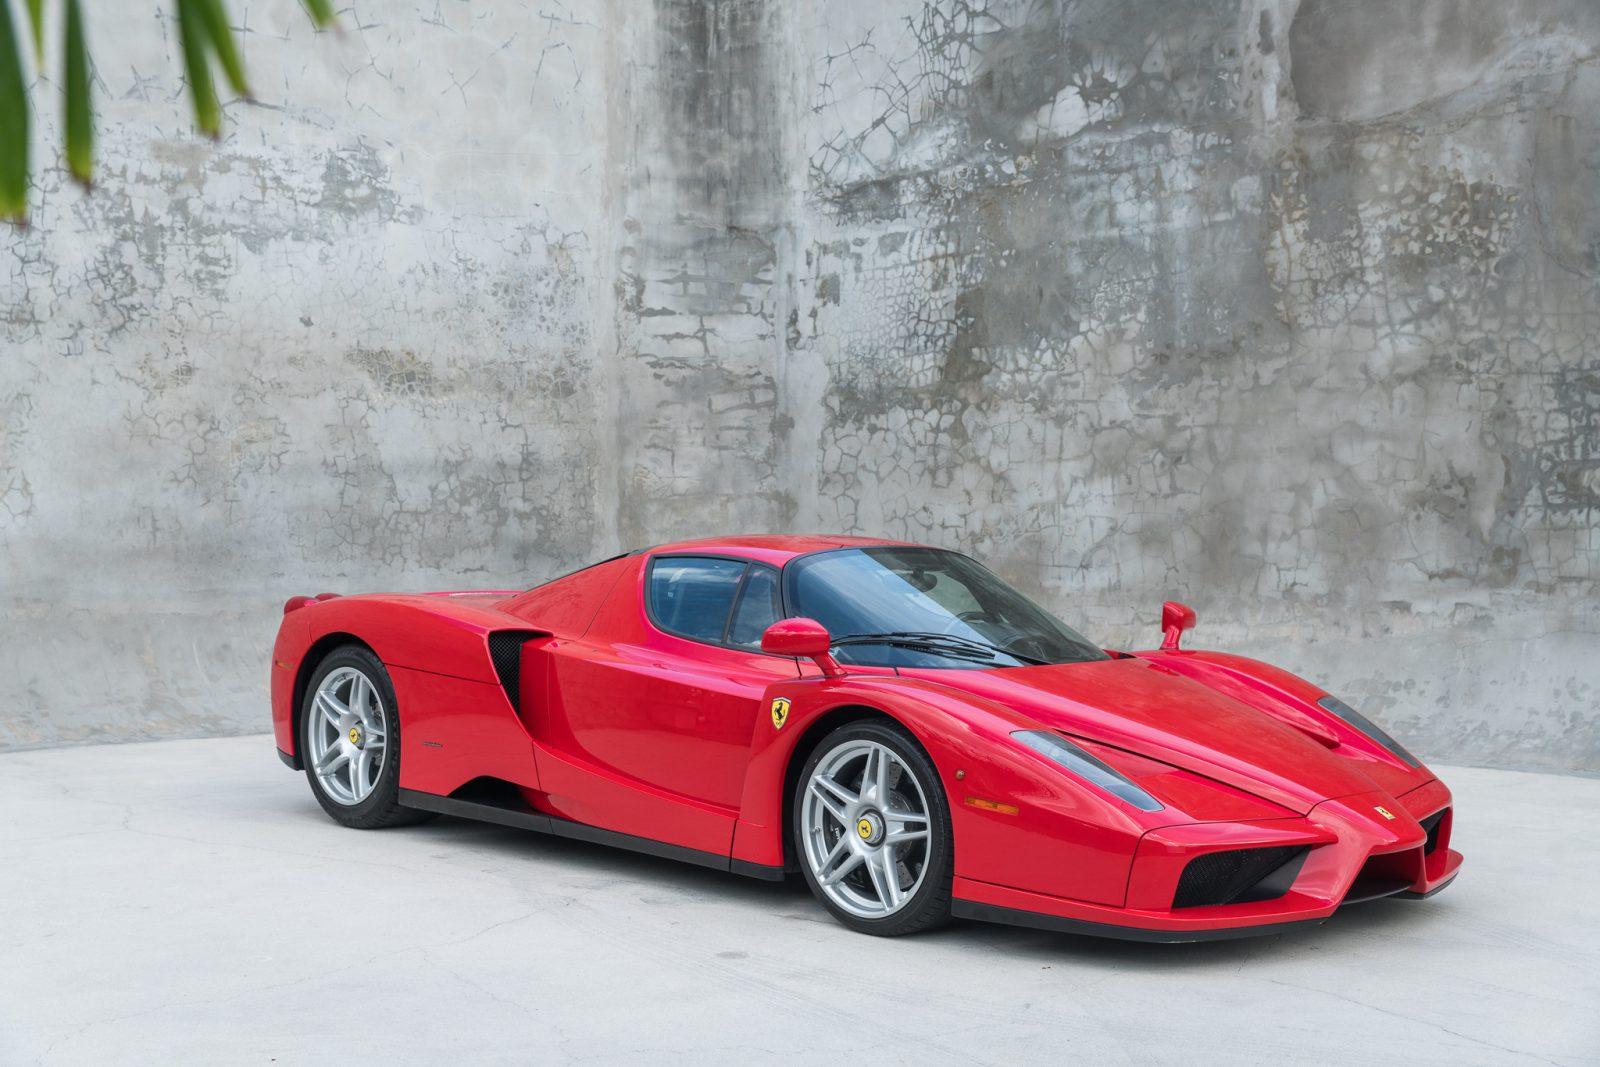 Ferrari Enzo Red 52 Curated